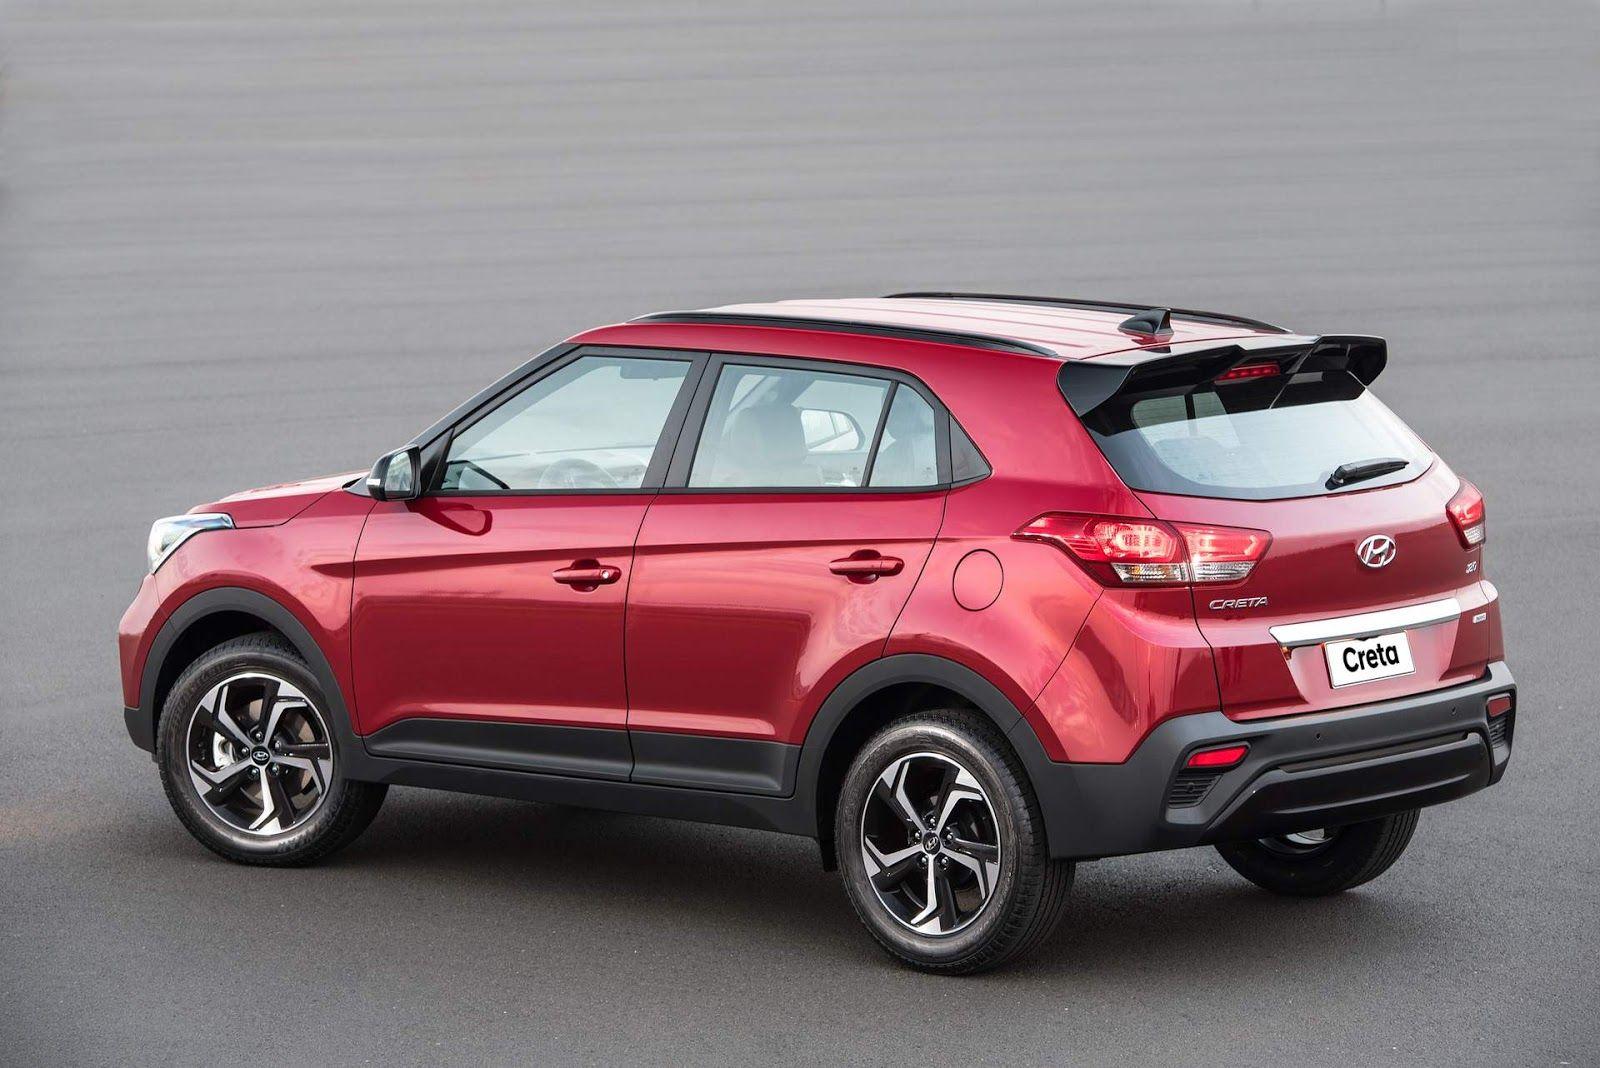 Novo Hyundai Creta 2020 Fotos Preco Consumo Medio Carros Carros Suv Carros Hyundai